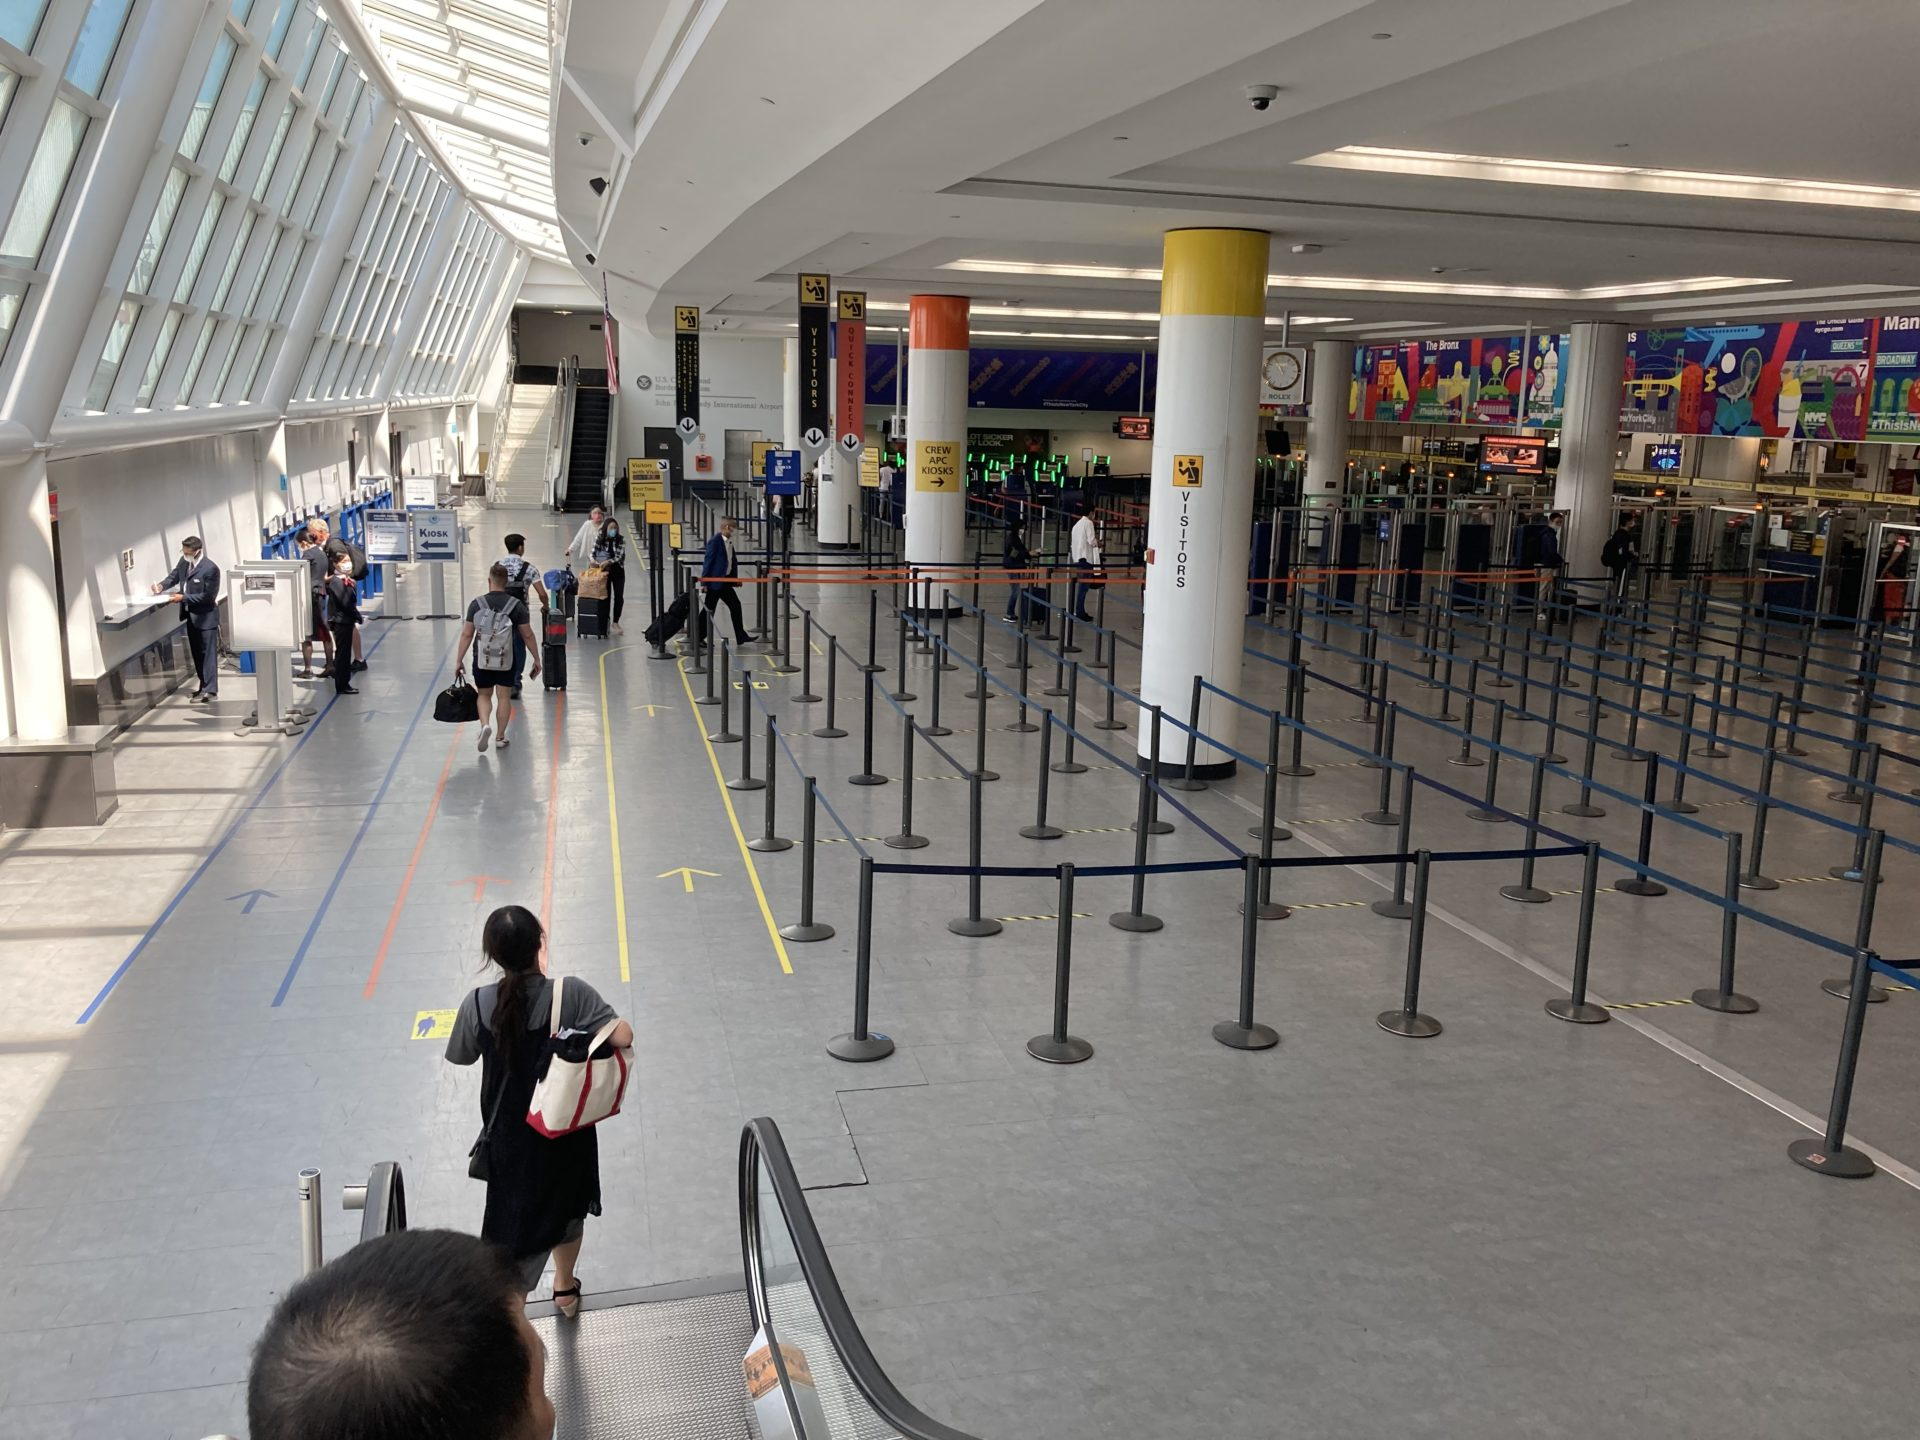 FK国際空港の入国手続きについて徹底解説